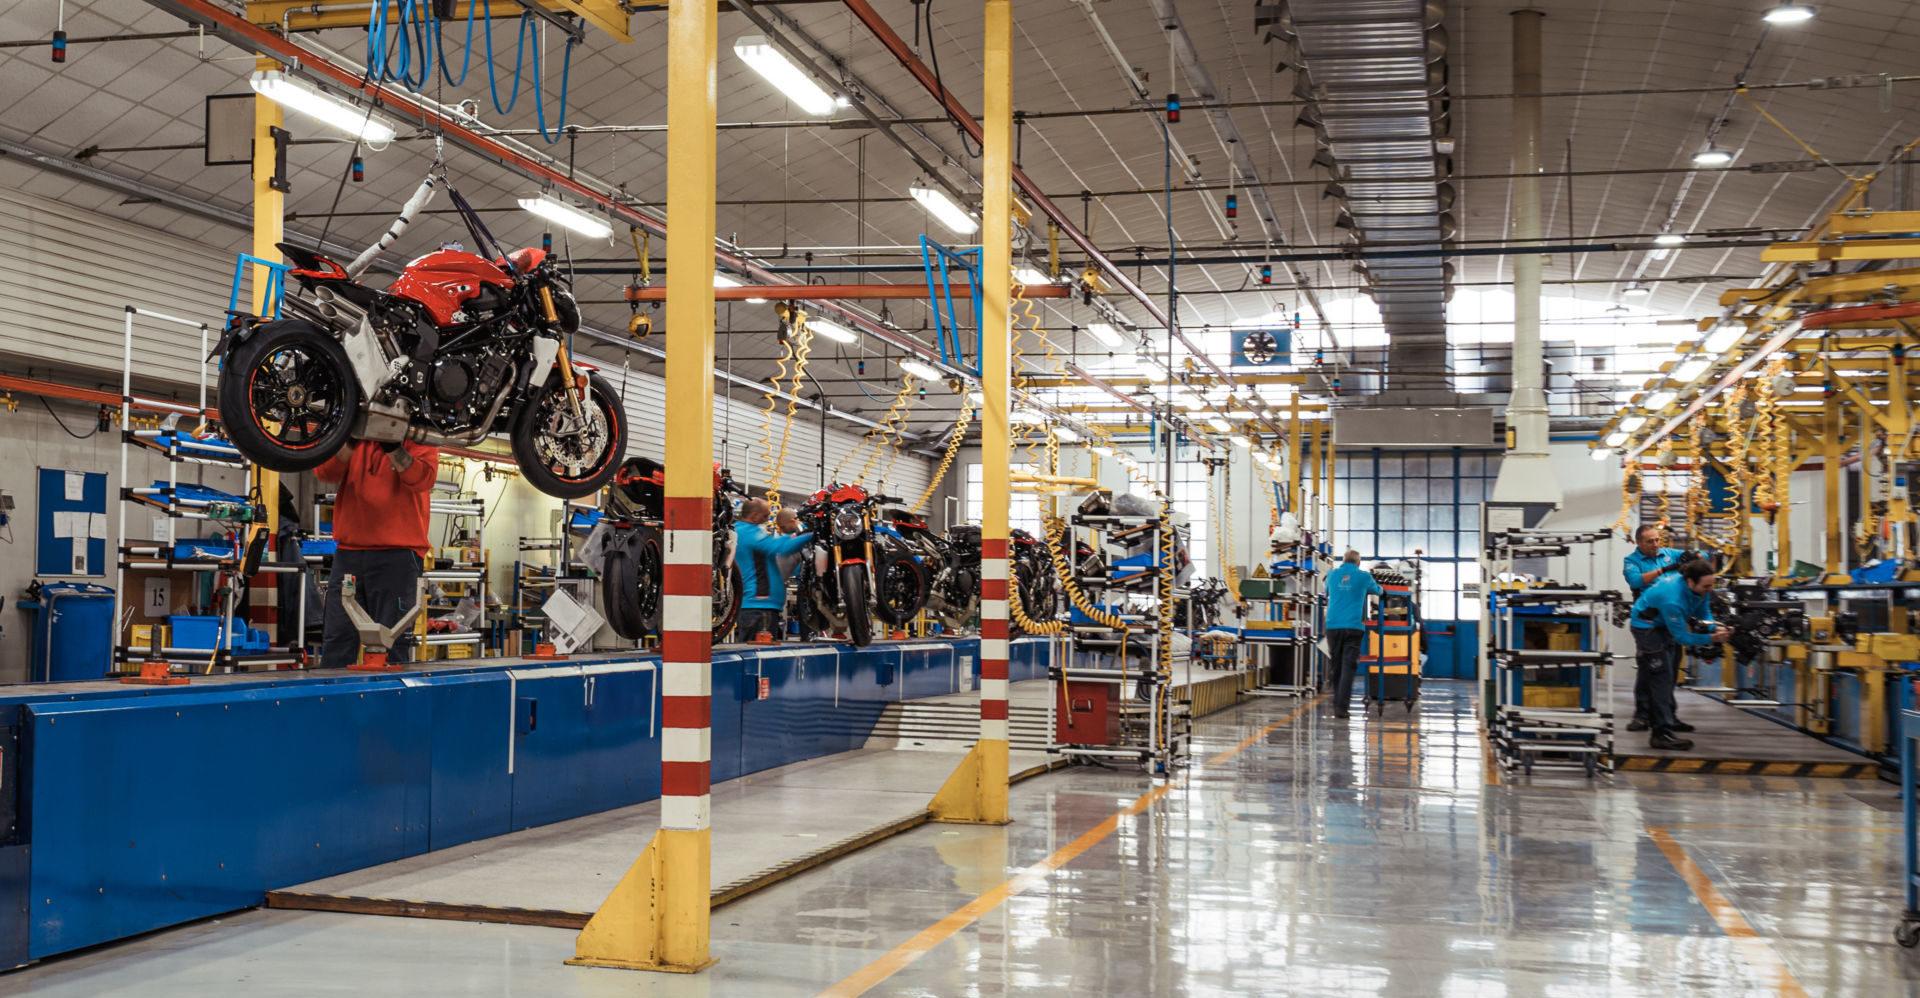 MV Agusta's factory in Varese, Italy. Photo courtesy of MV Agusta.